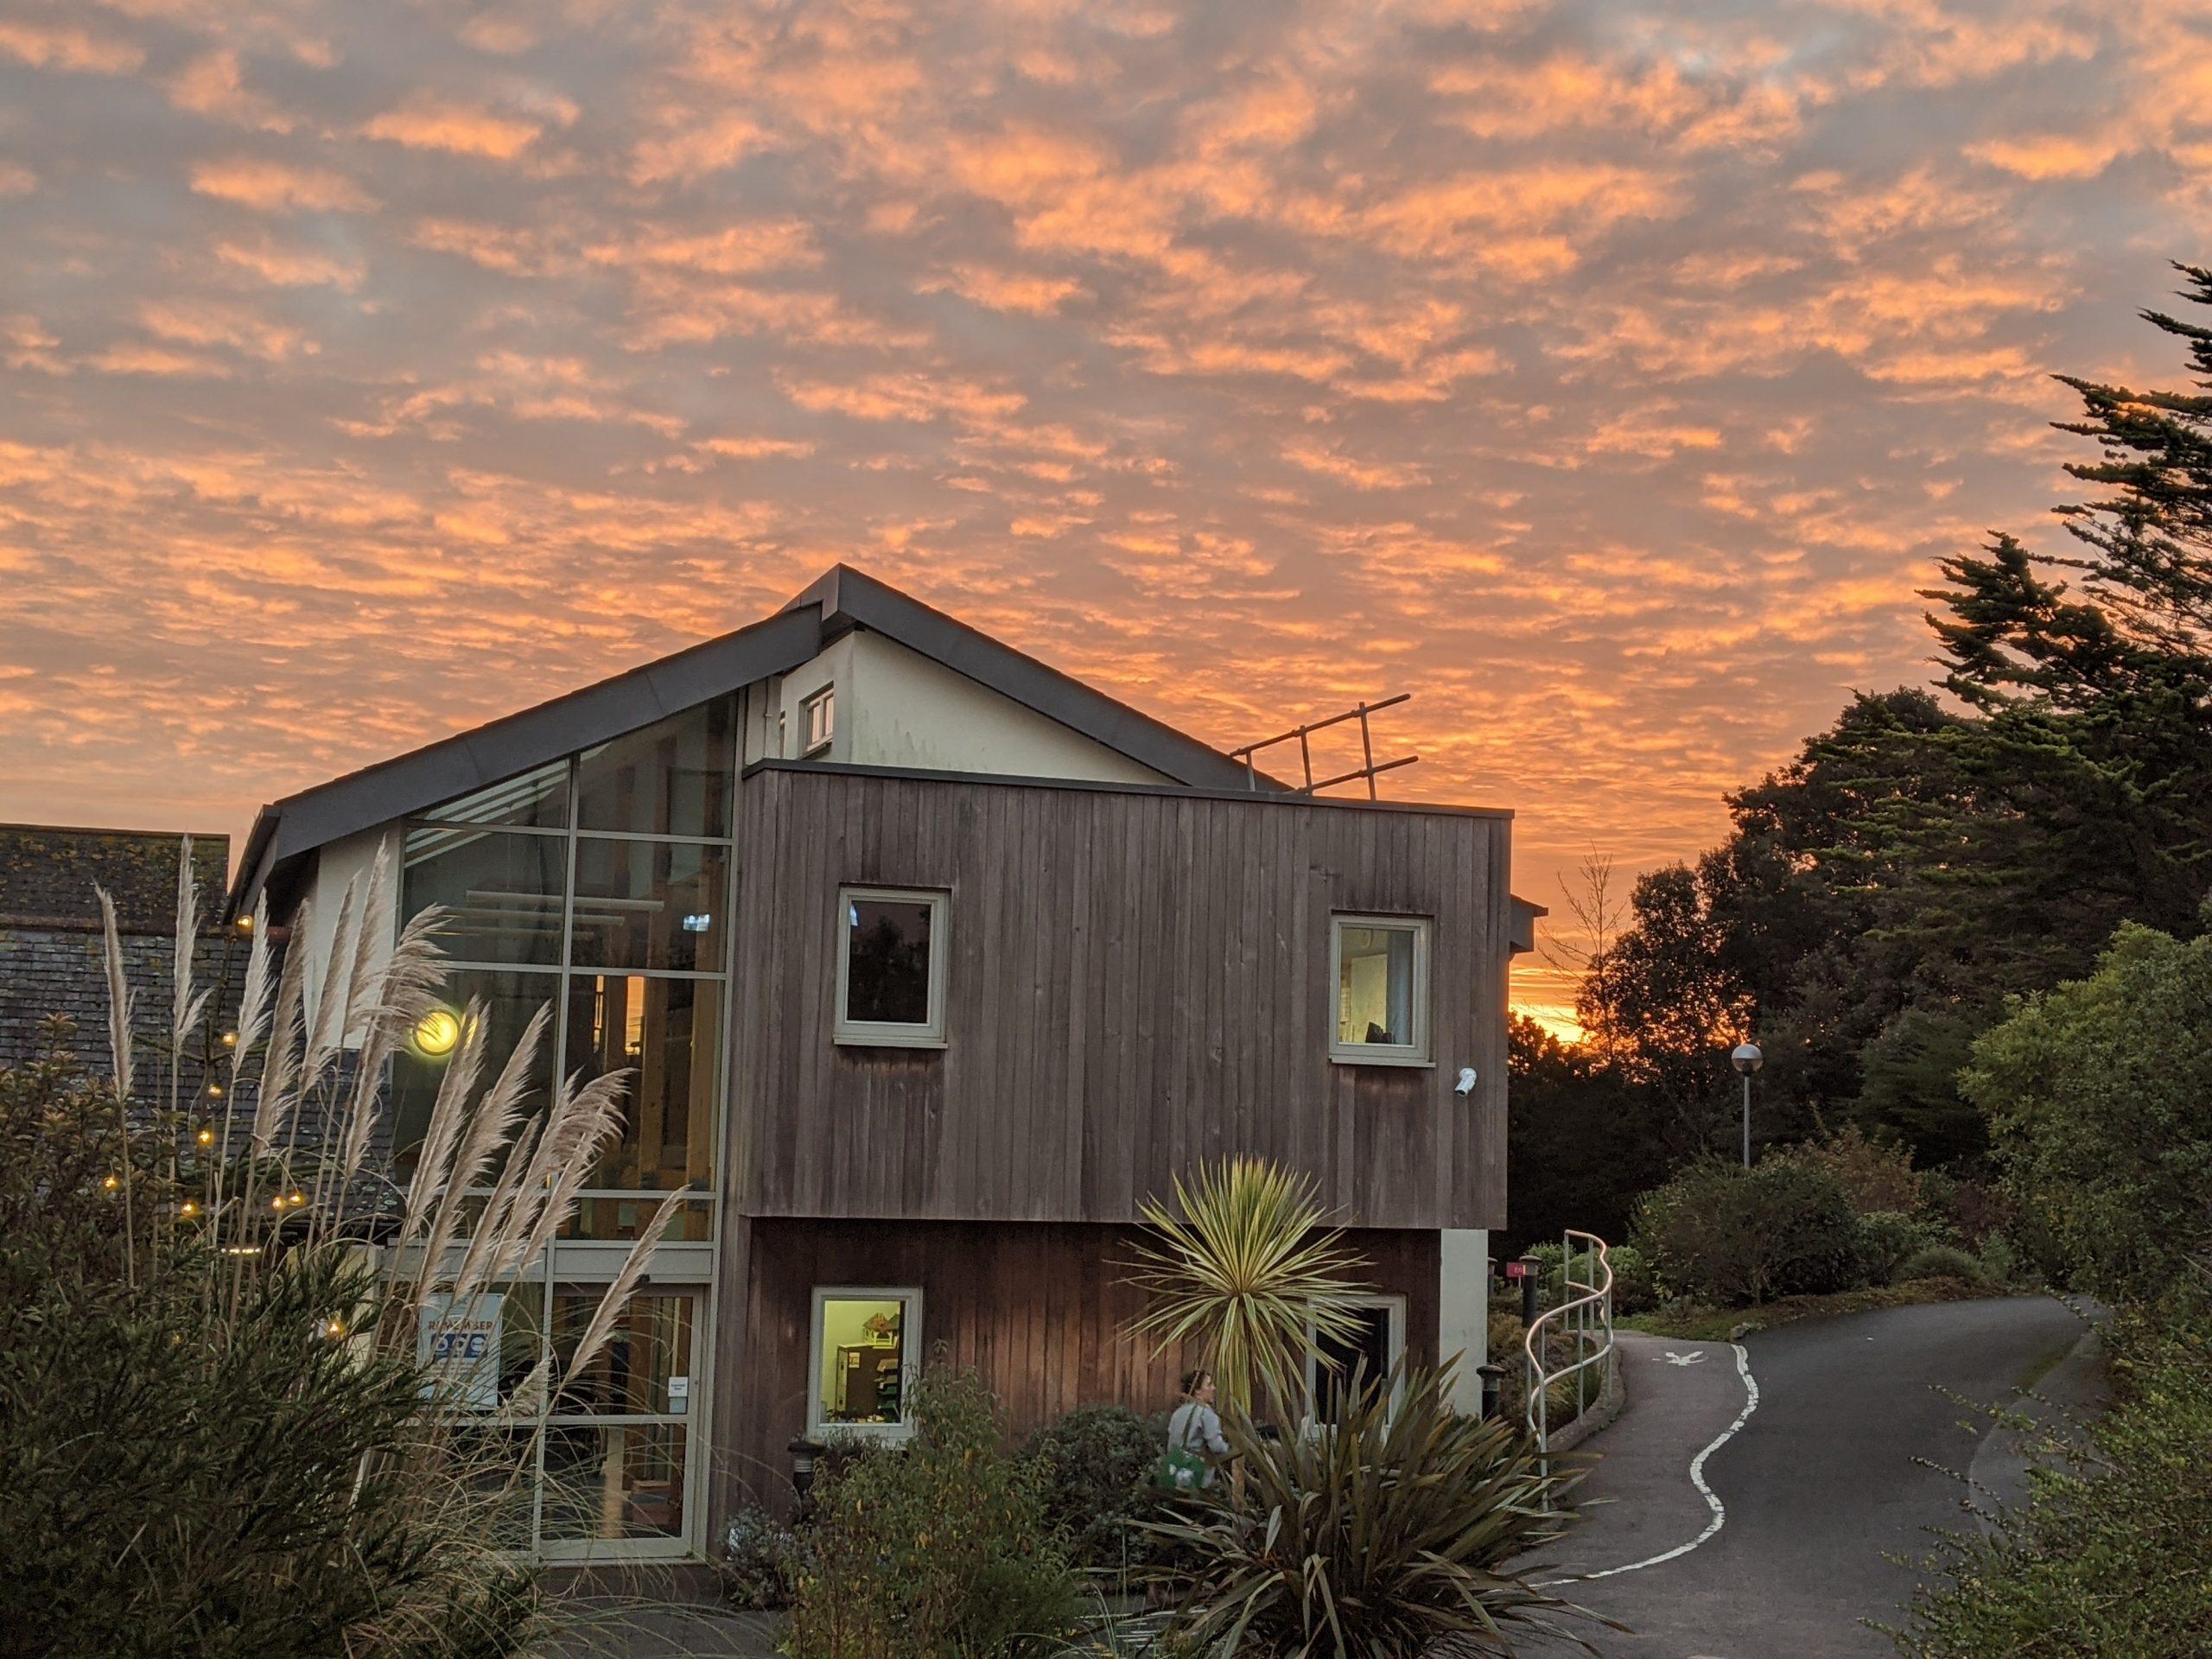 St Julia's Hospice sunset